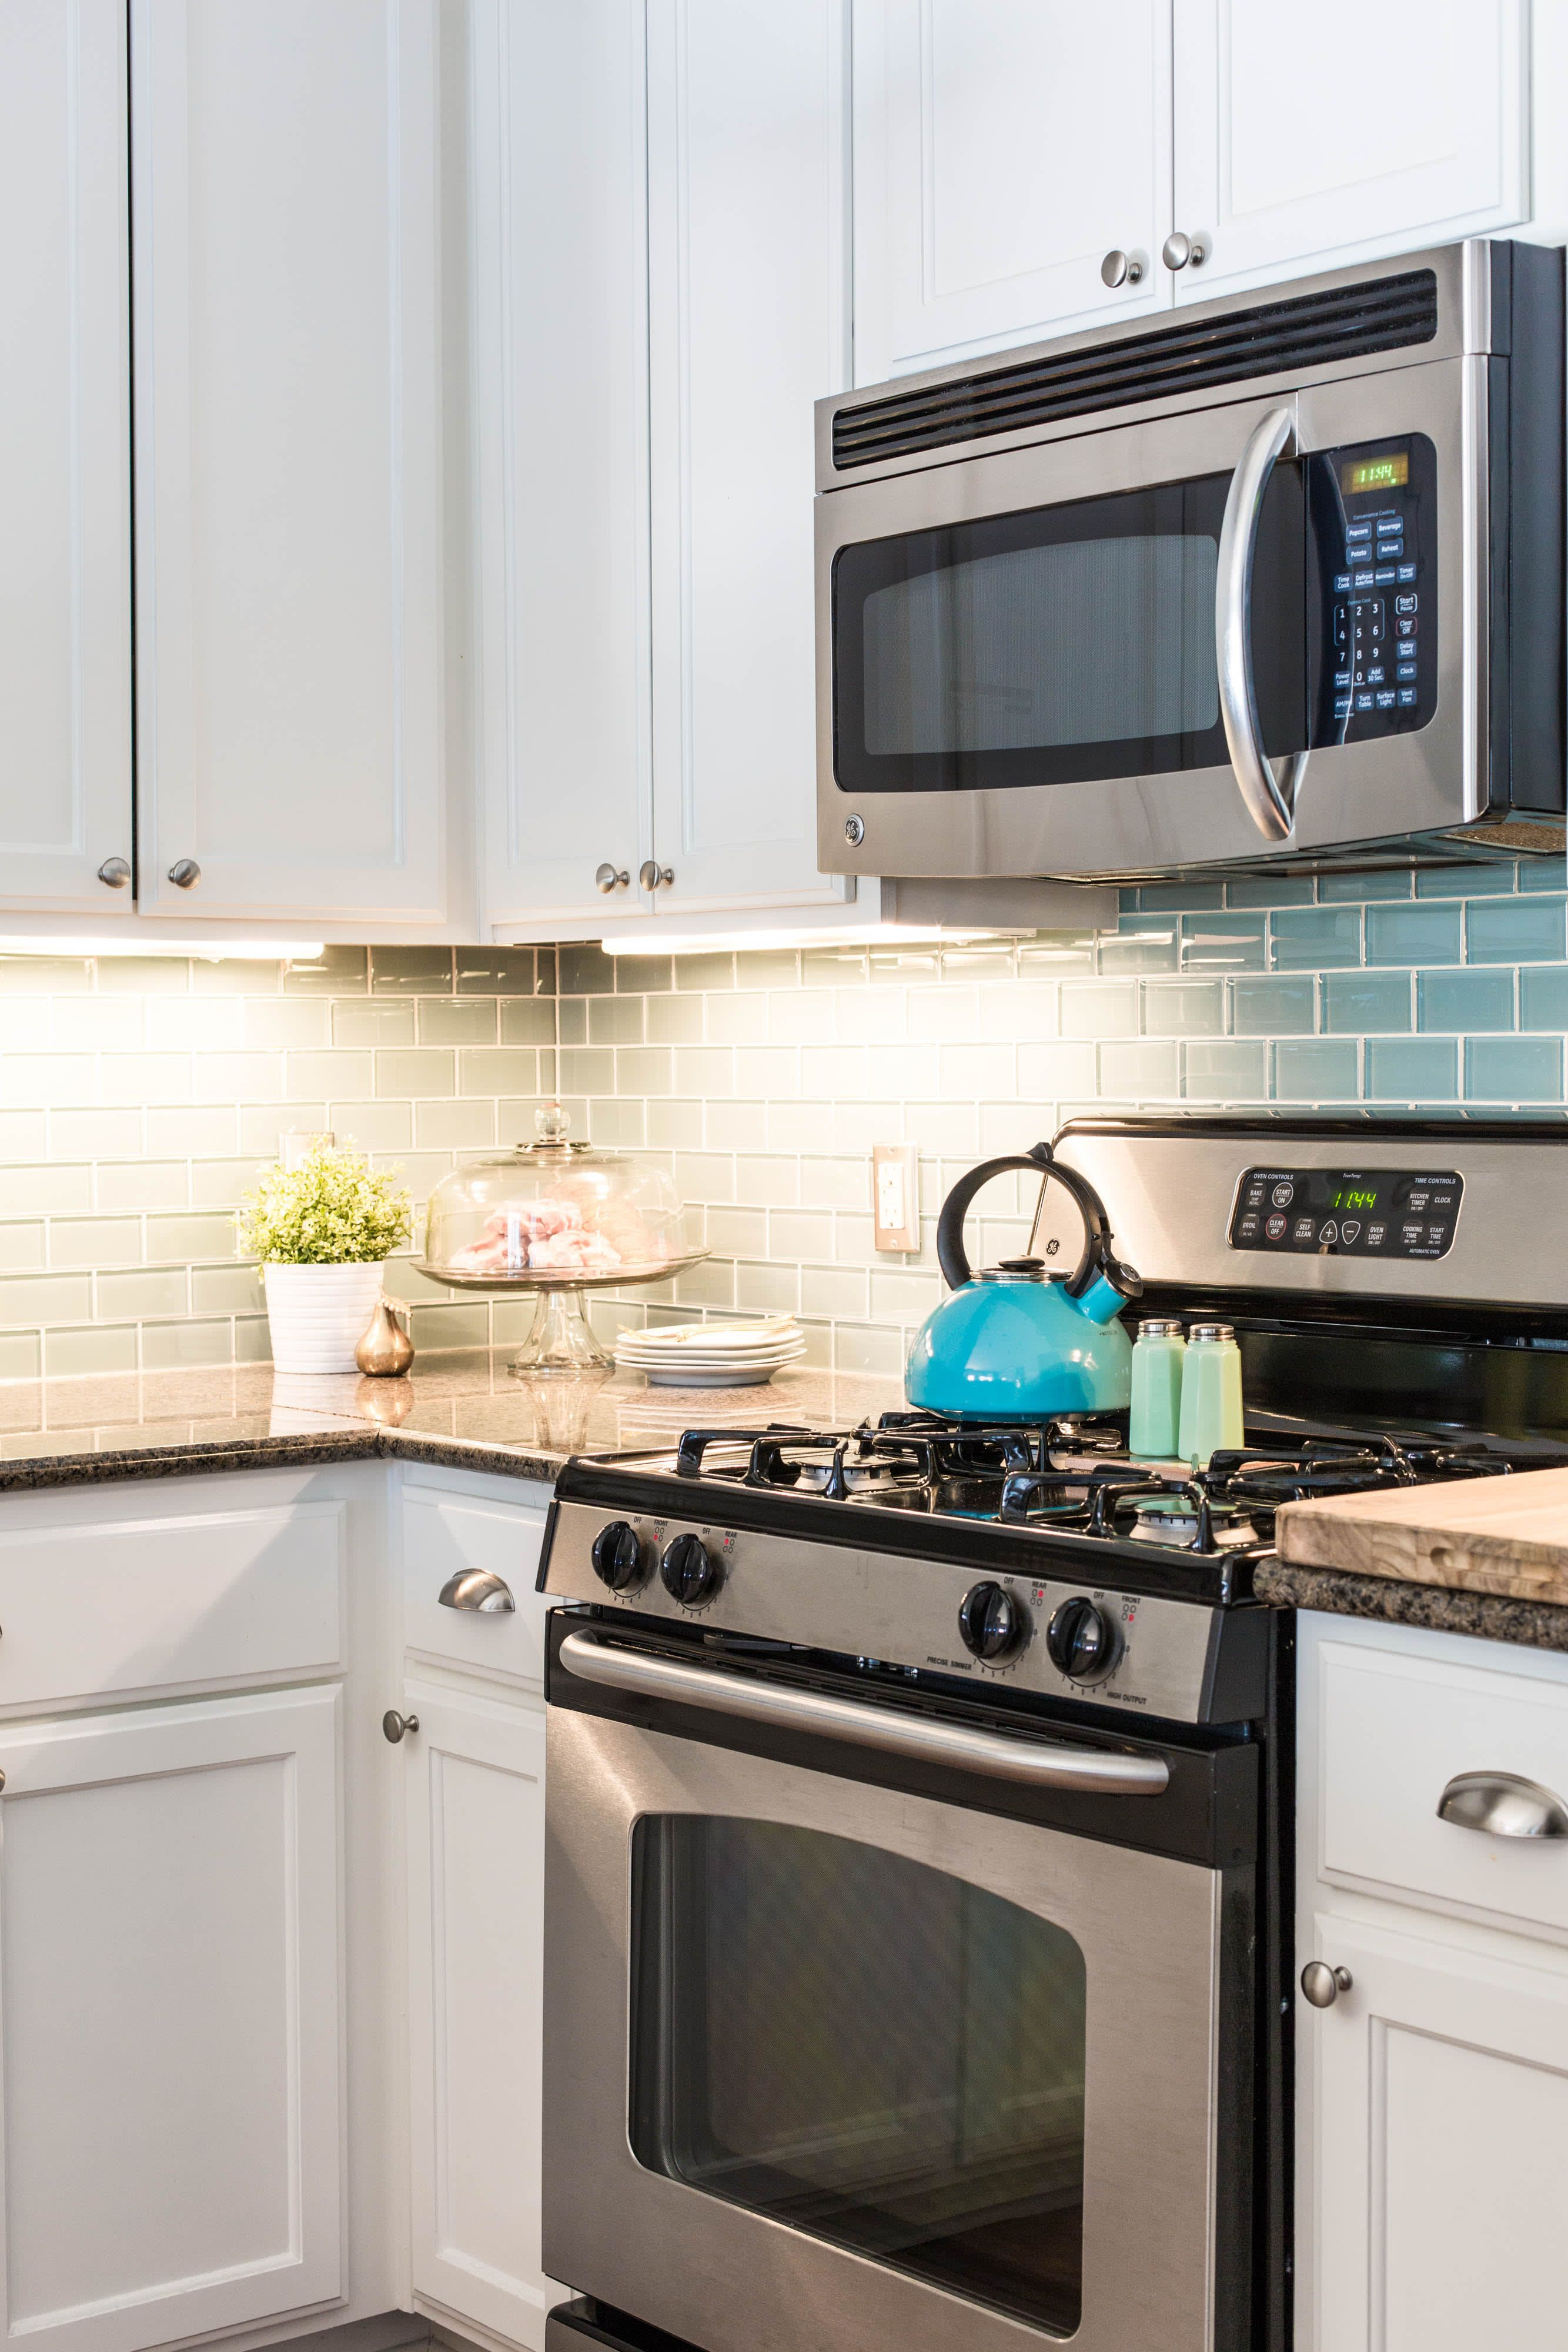 10 Brilliant Ways To Improve Your Rental Kitchen Rental Kitchen Kitchen Cabinets Tiny Kitchen